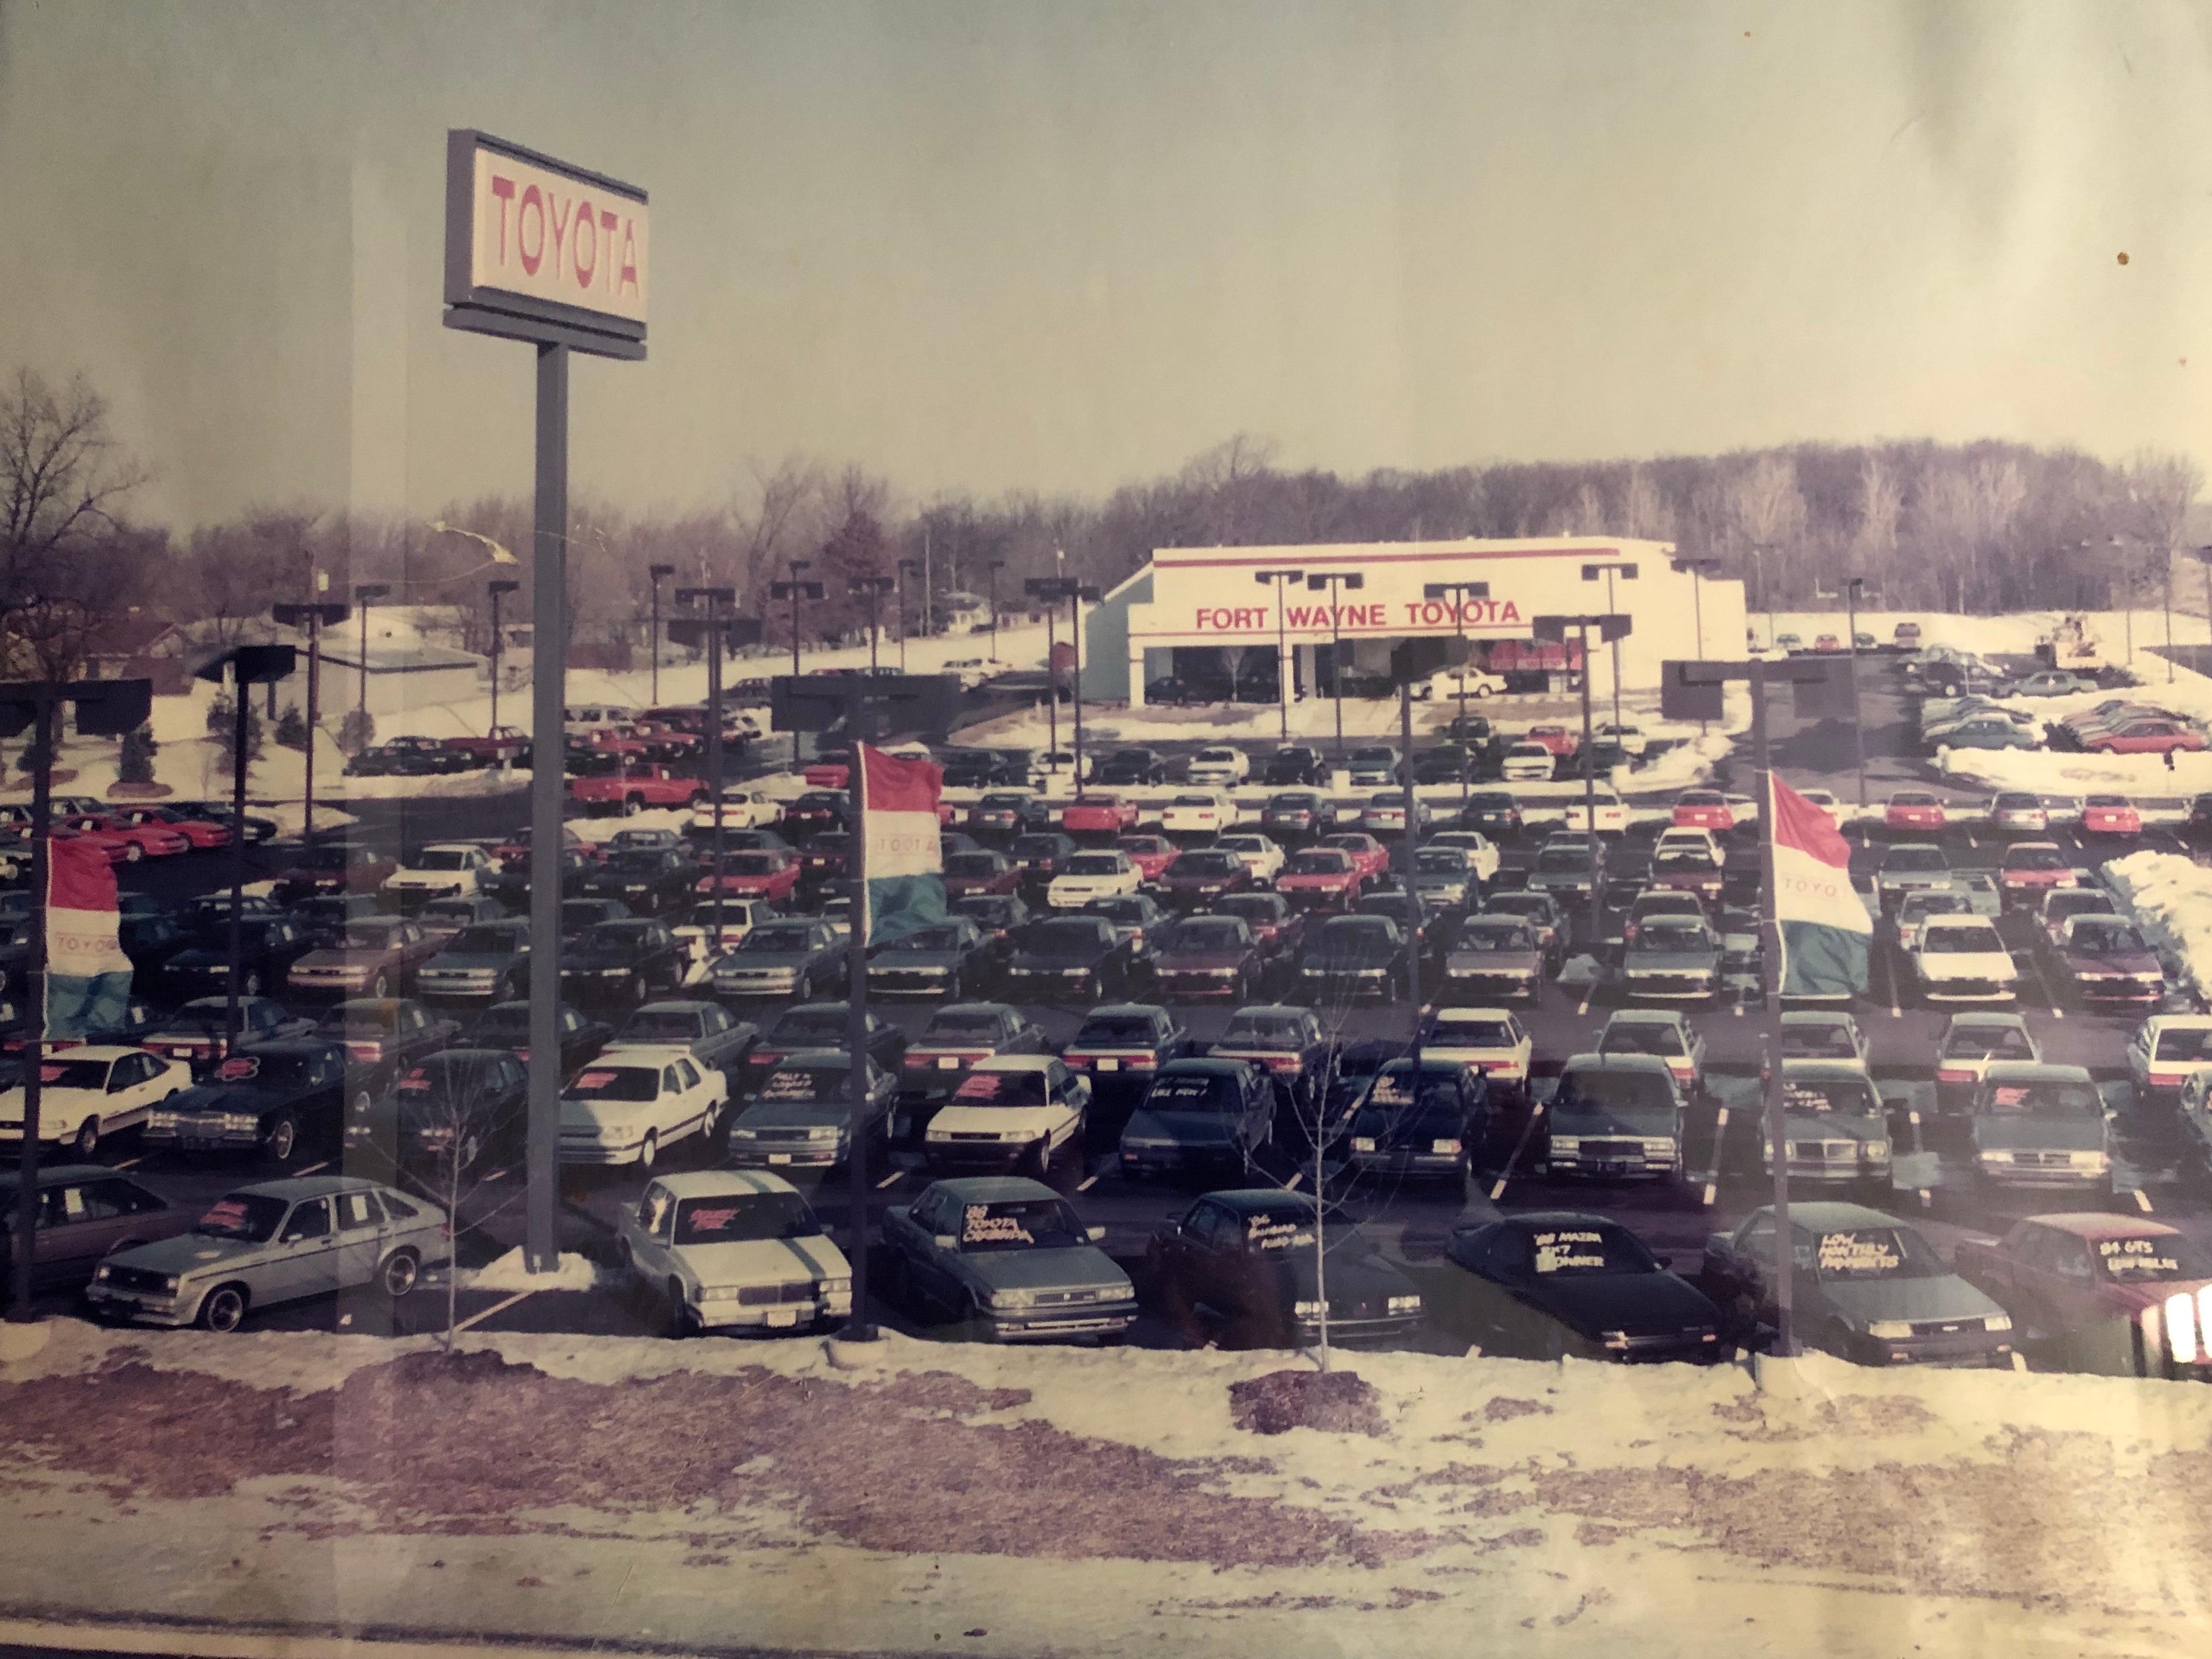 Fort Wayne Toyota >> About Bob Rohrman Fort Wayne Toyota Fort Wayne Toyota